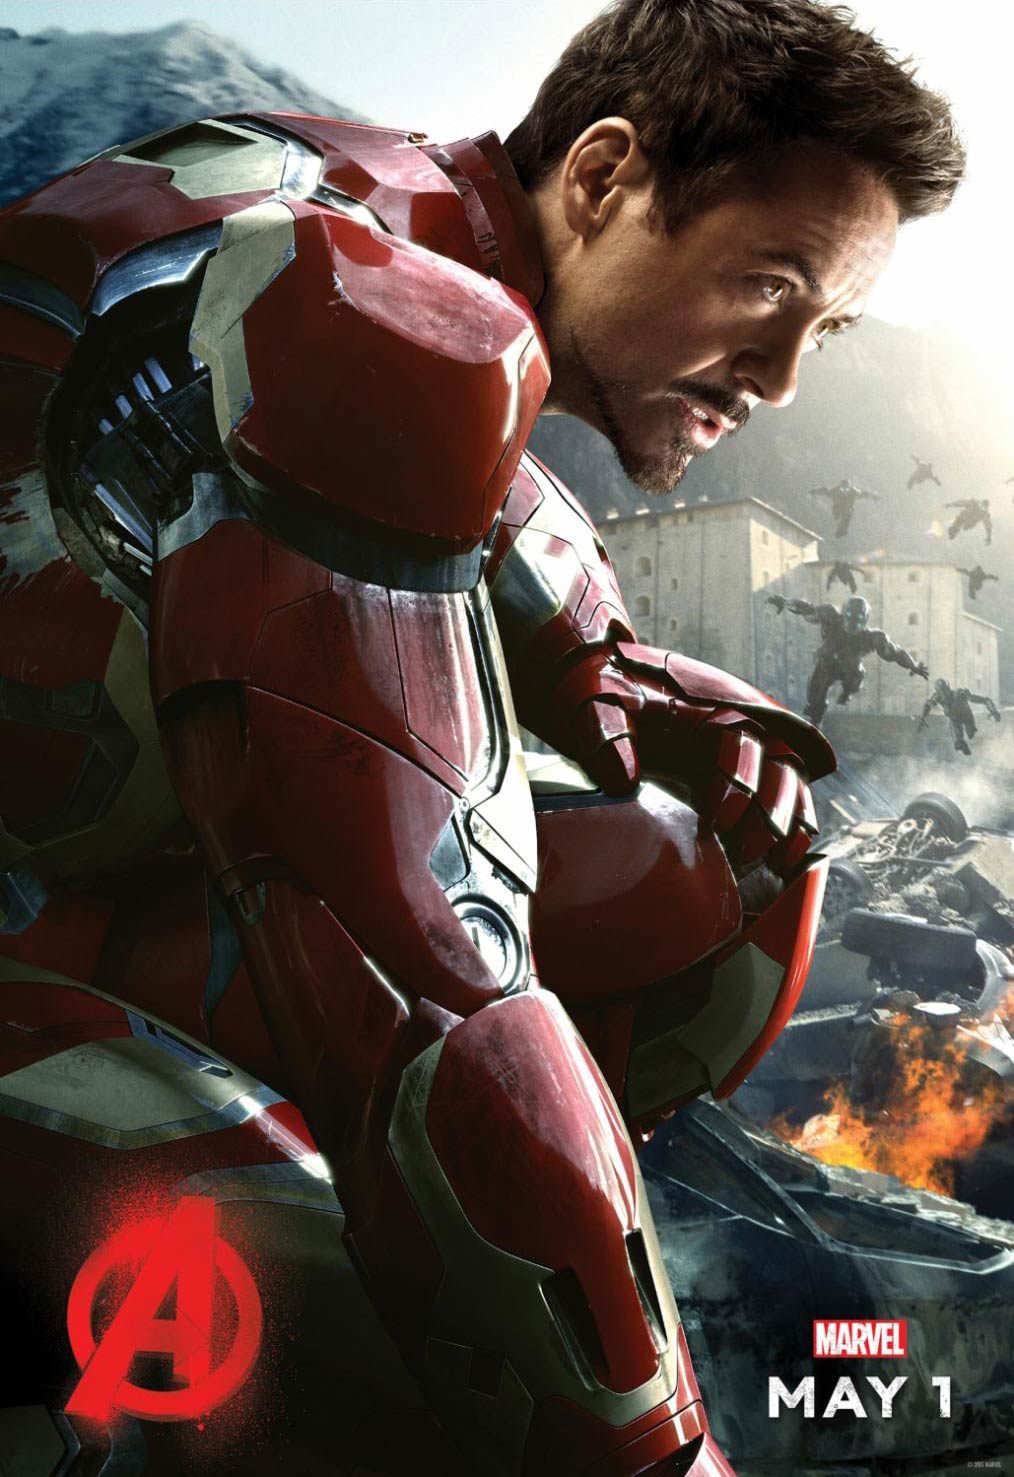 <strong>Robert Downey Jr. as Iron Man</strong>